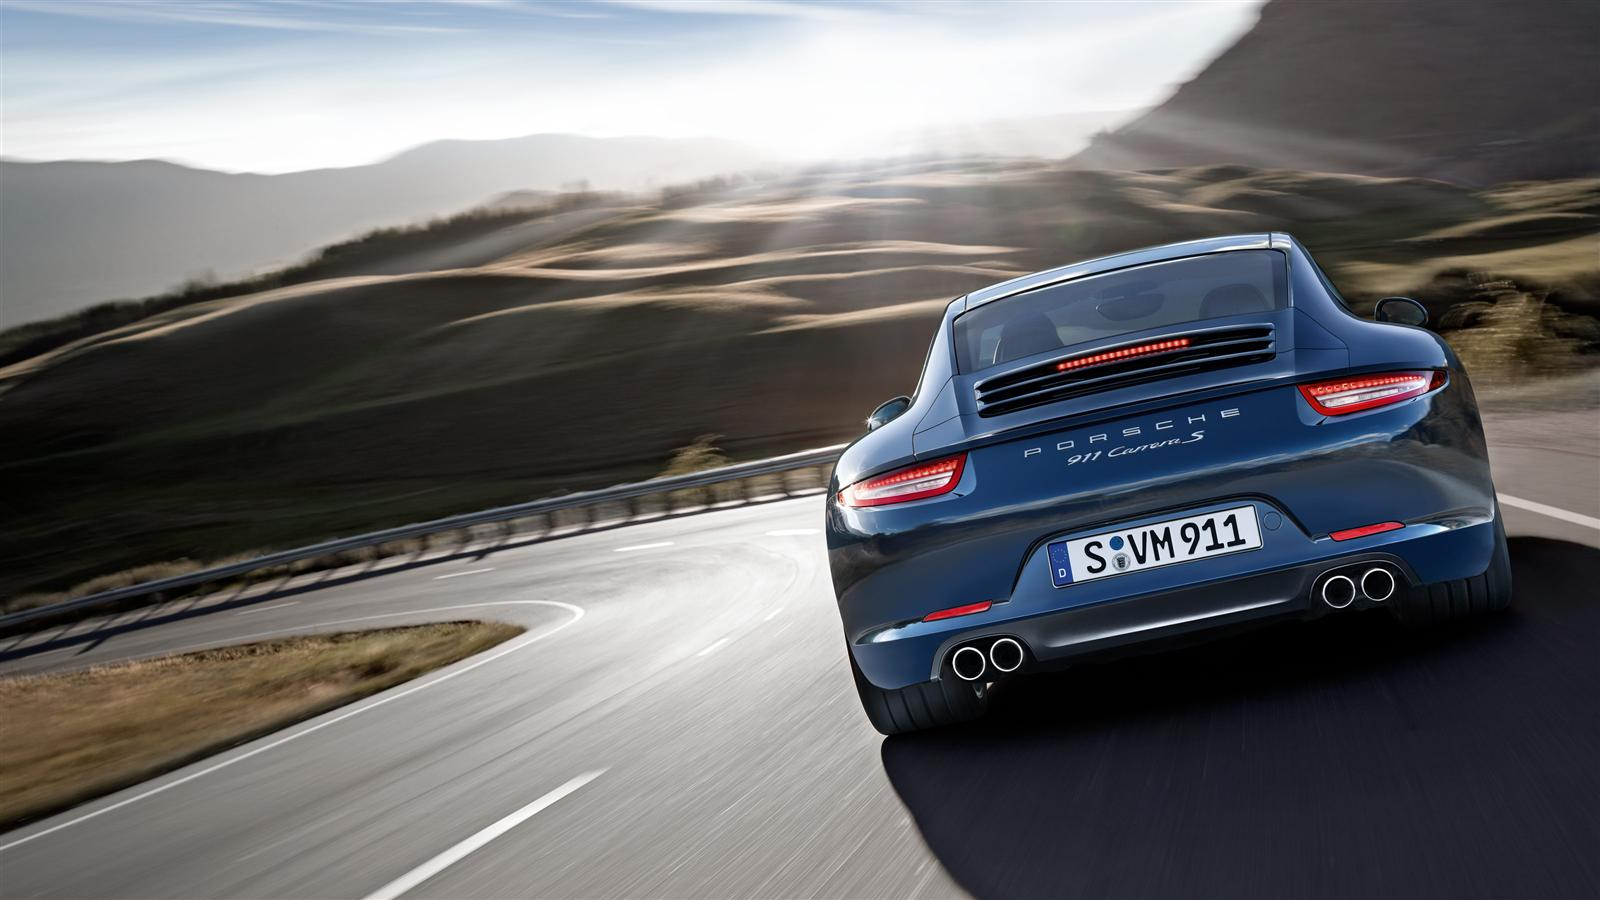 Porsche images Porsche 911 Carrera S HD wallpaper and background photos